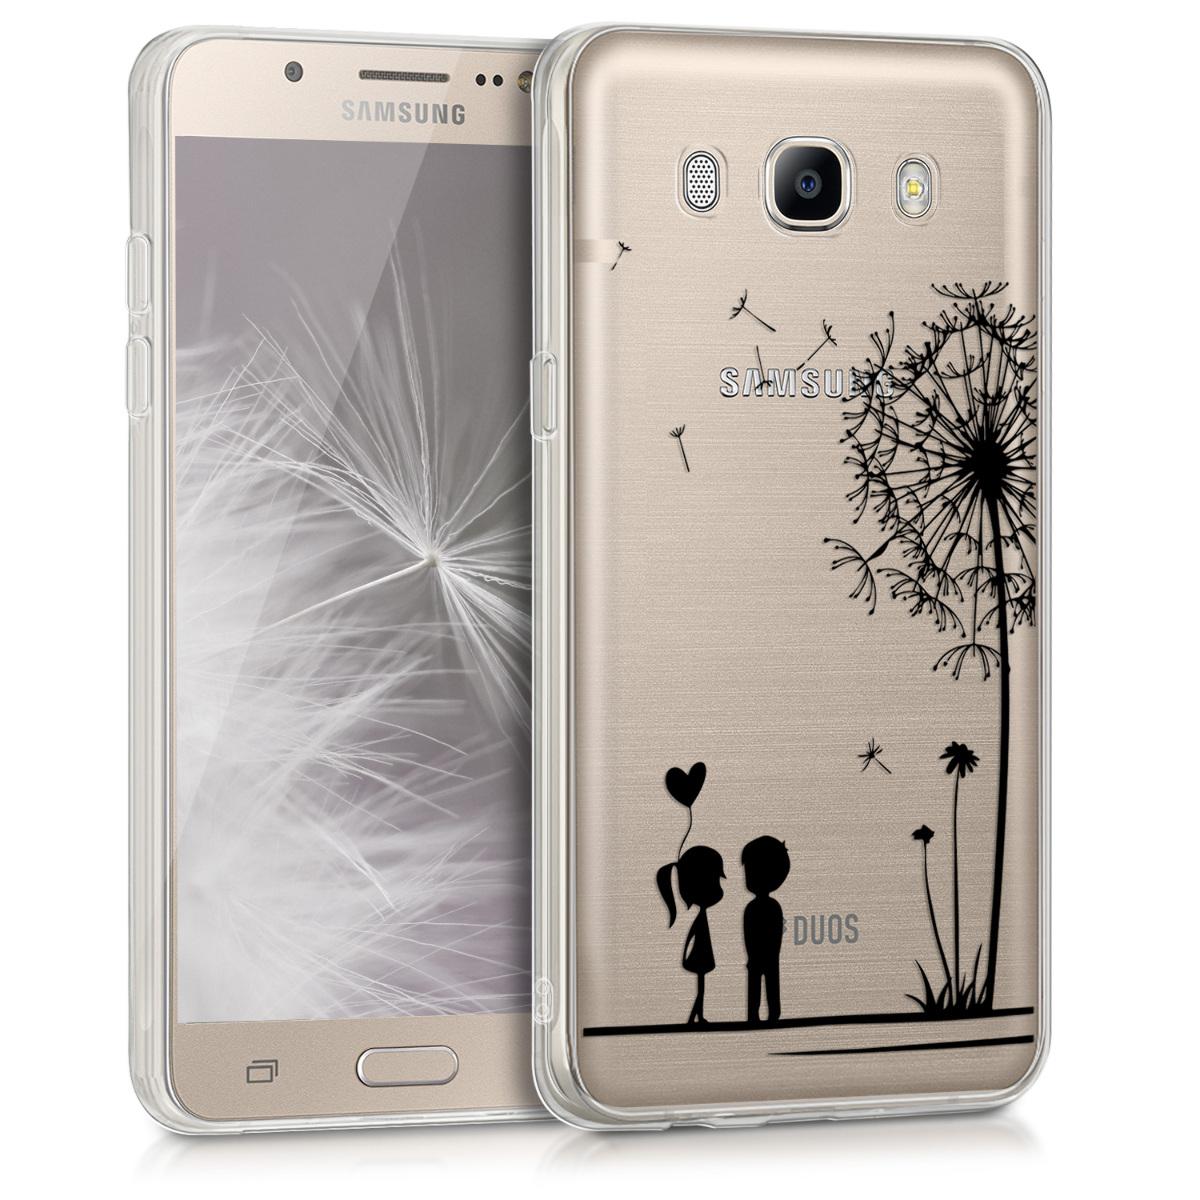 KW Θήκη Σιλικόνης Samsung Galaxy J5 2016 DUOS - Black / Transparent (39166.06)